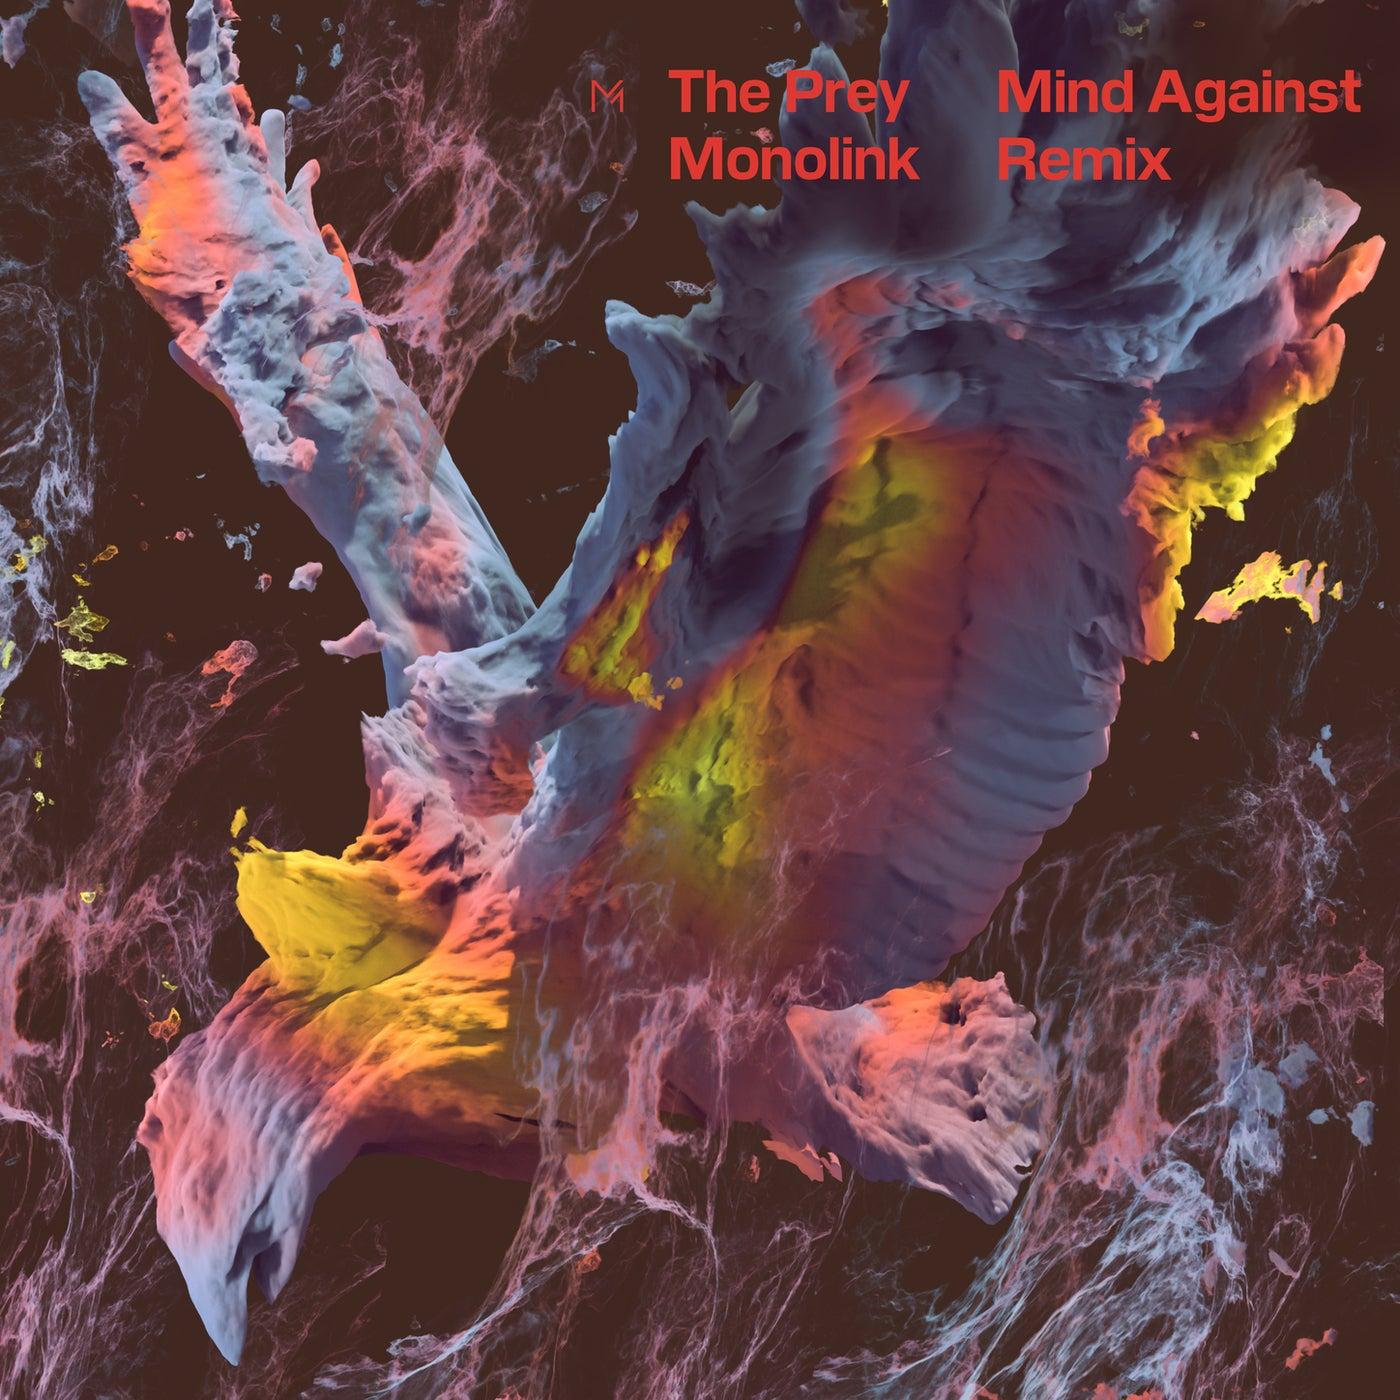 The Prey (Mind Against Remix)